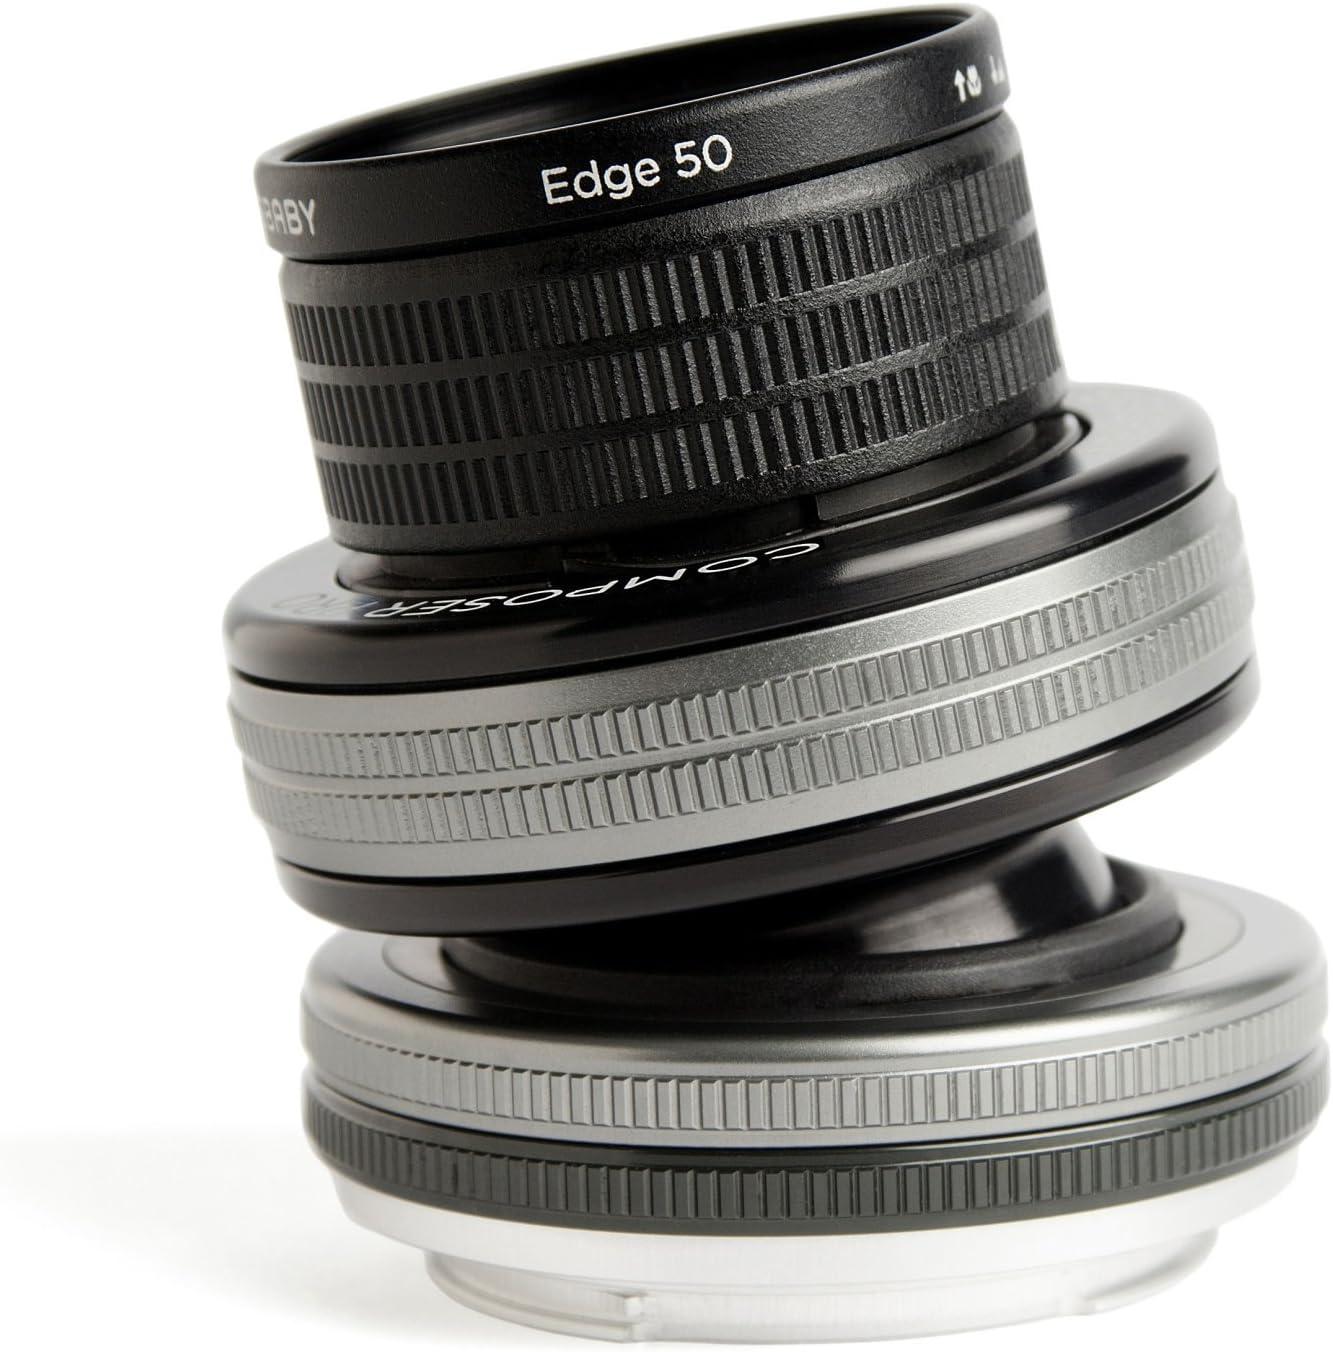 Lensbaby Composer Pro Ii 50 Mm Edge 50 Objektiv Für Kamera